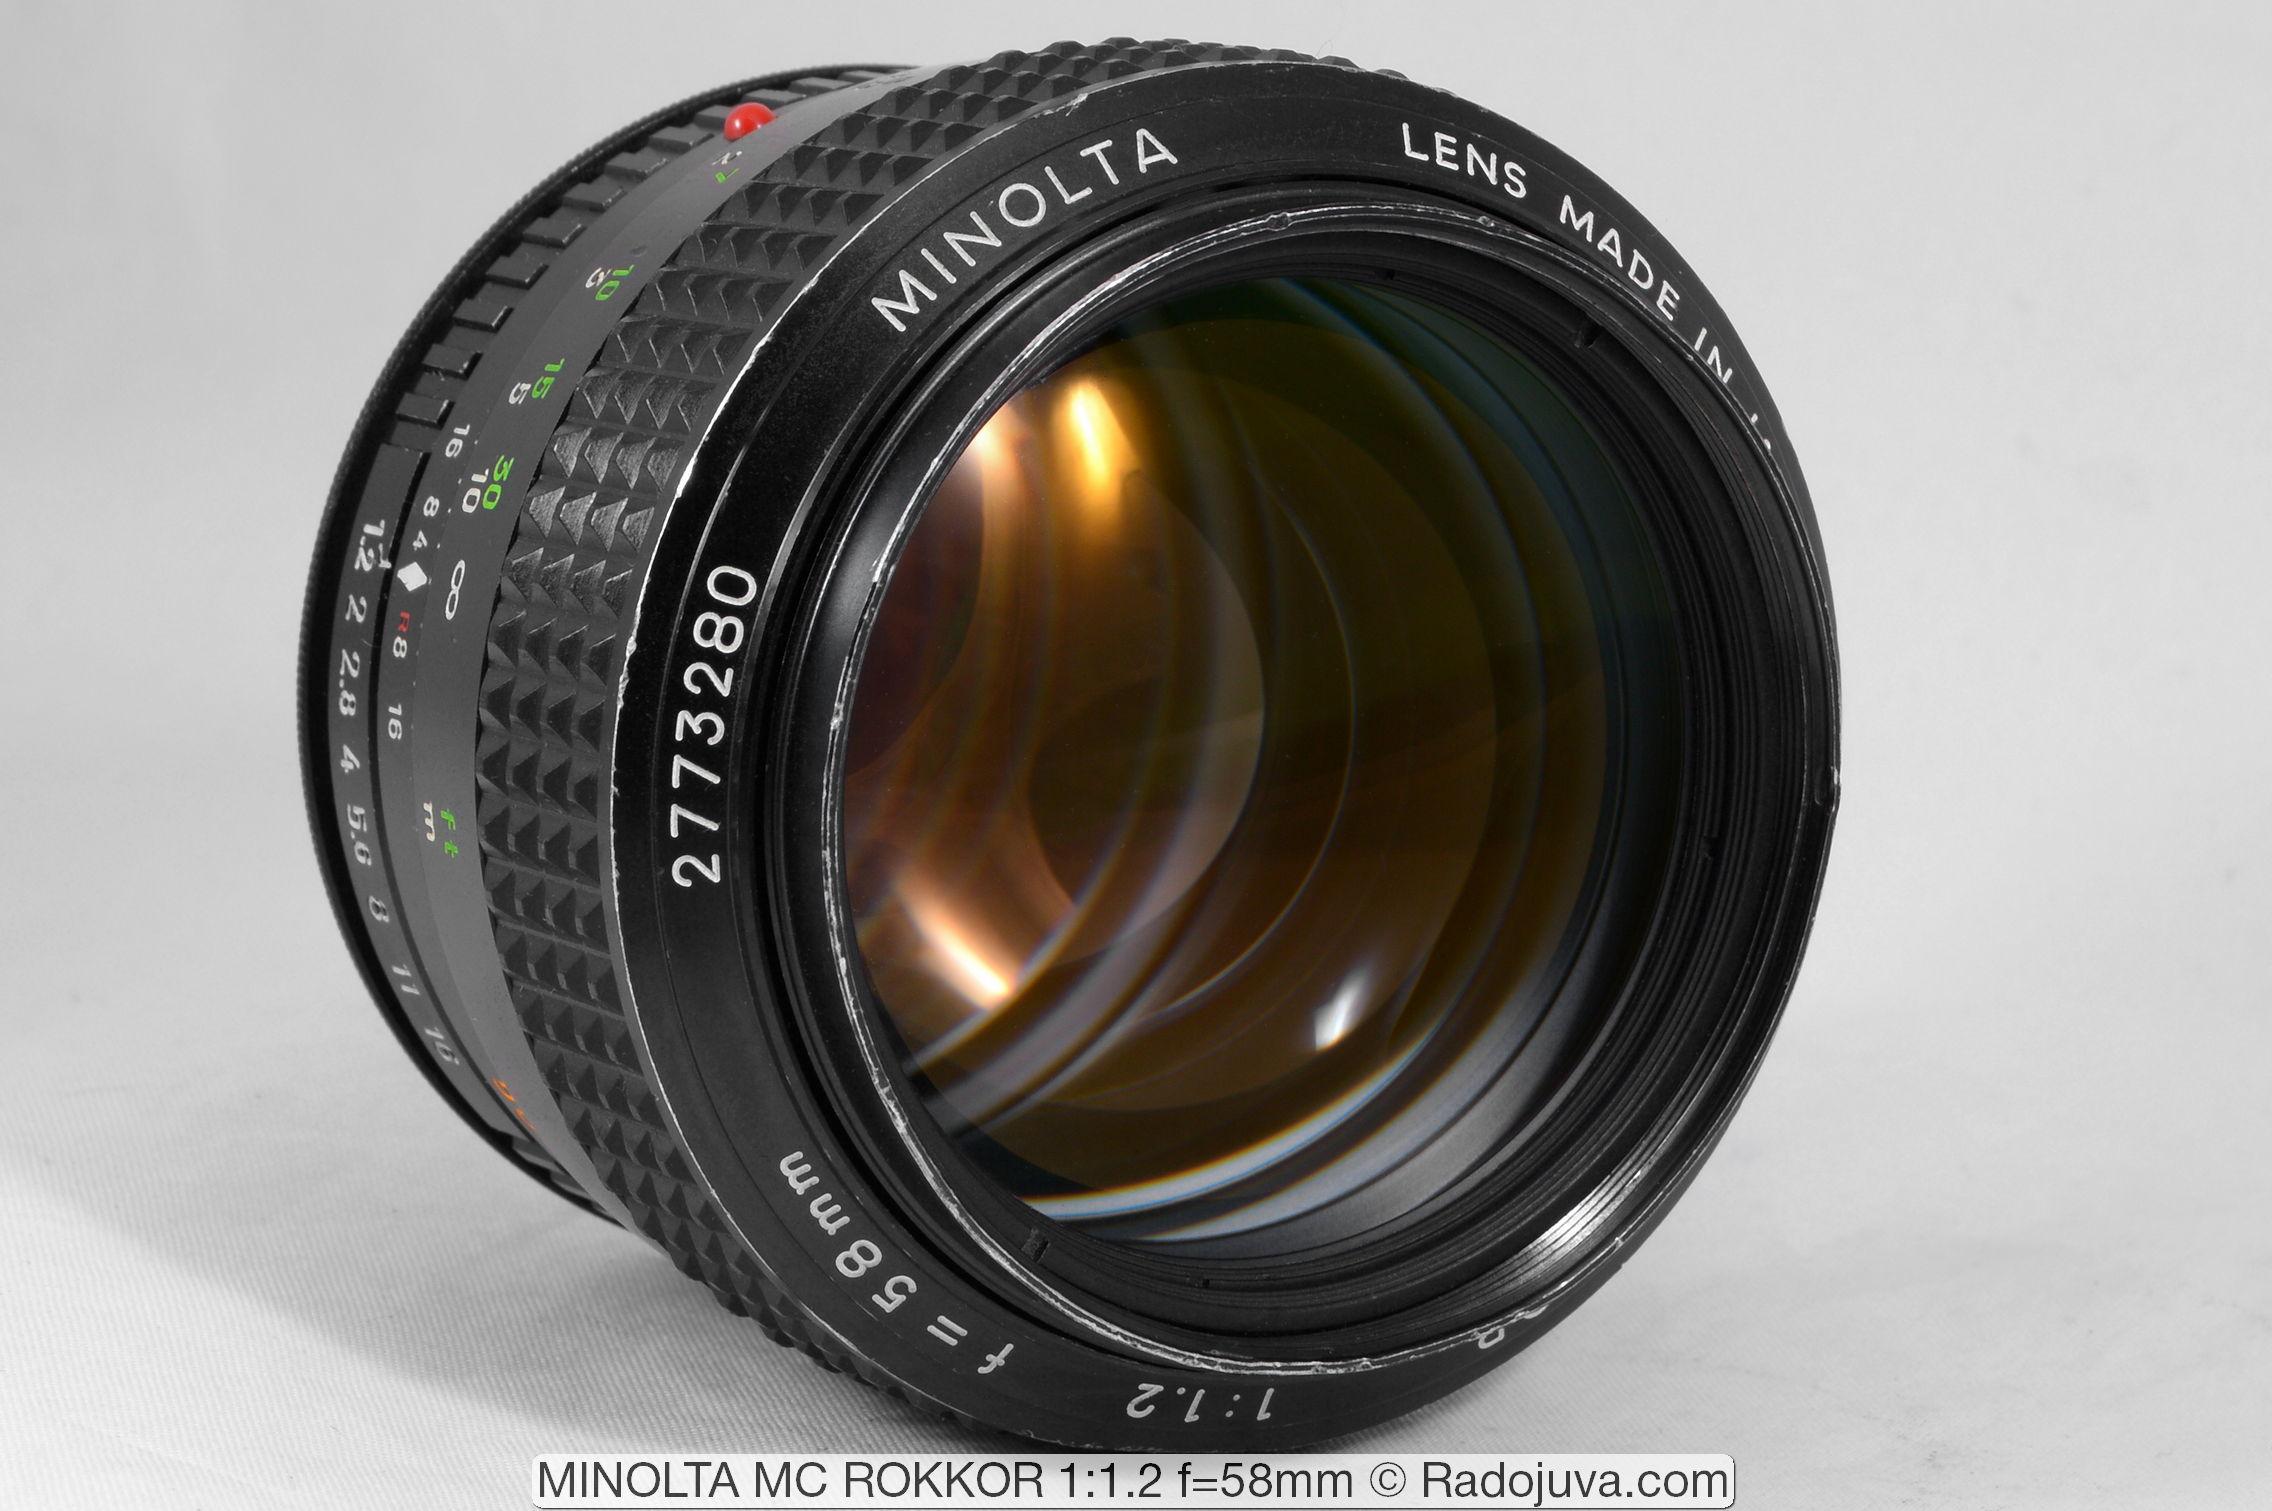 MINOLTA MC ROKKOR 1:1.2 f=58mm